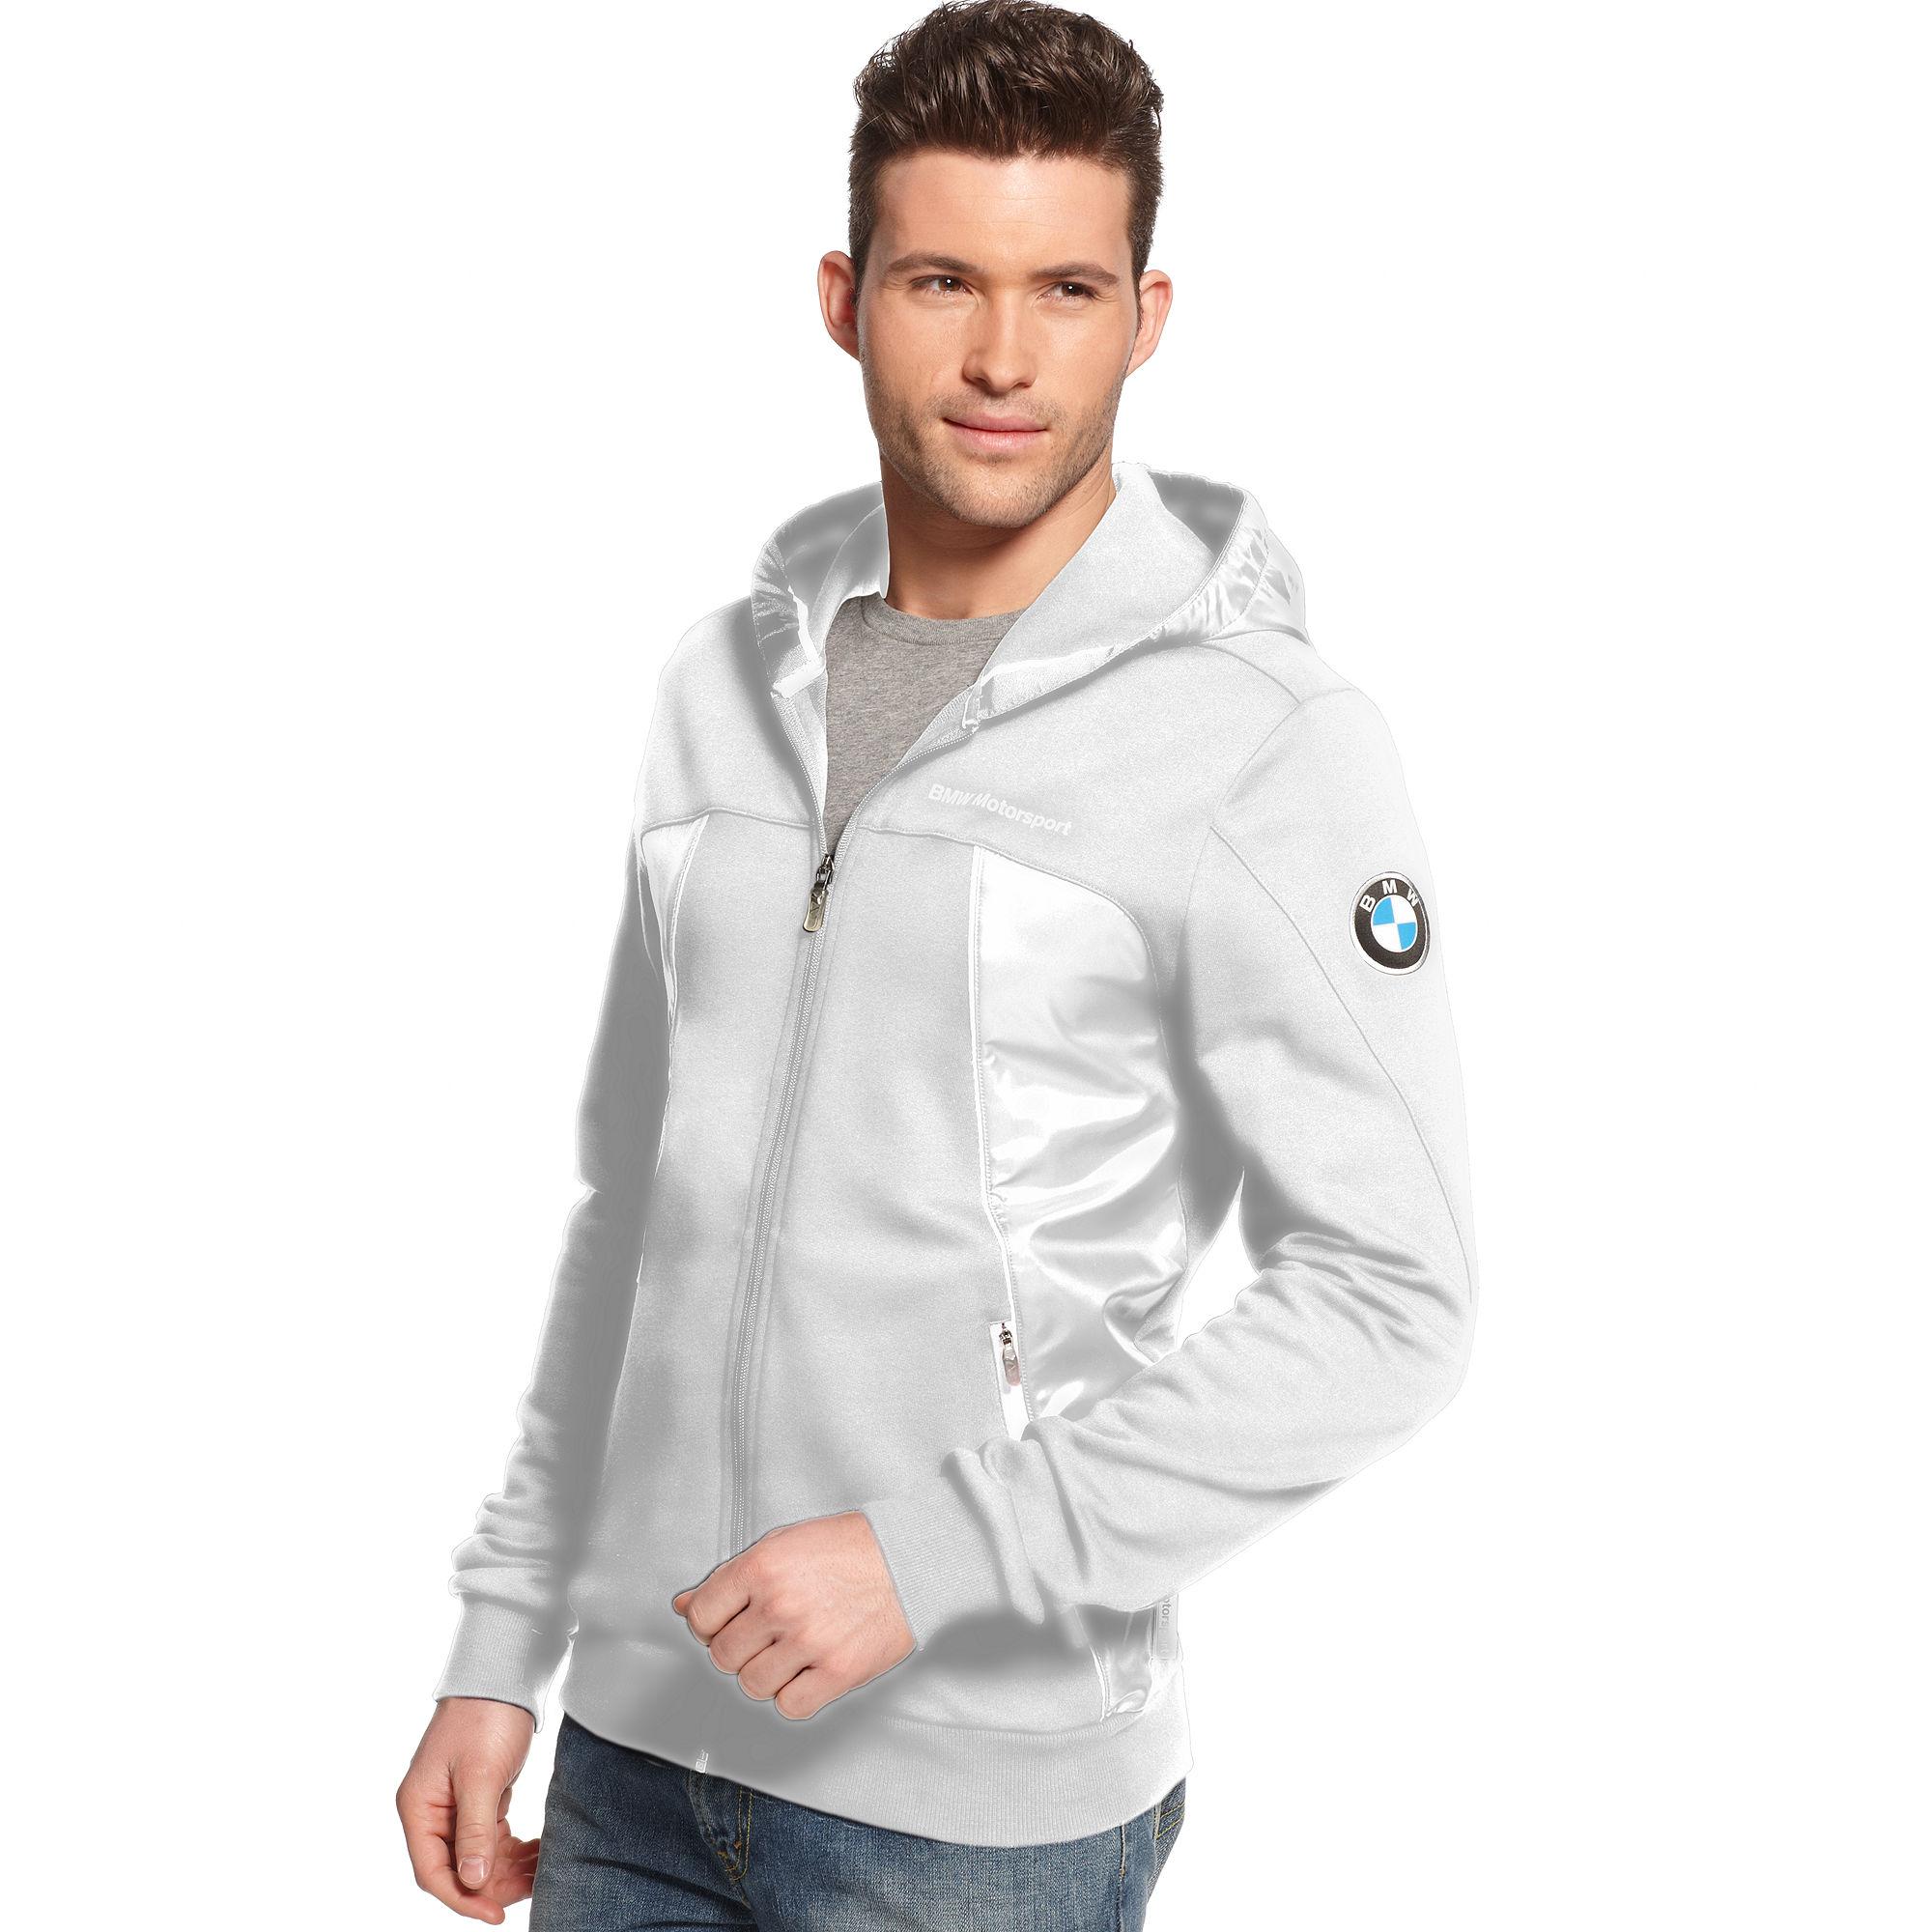 lyst puma bmw hooded sweat jacket in gray for men. Black Bedroom Furniture Sets. Home Design Ideas